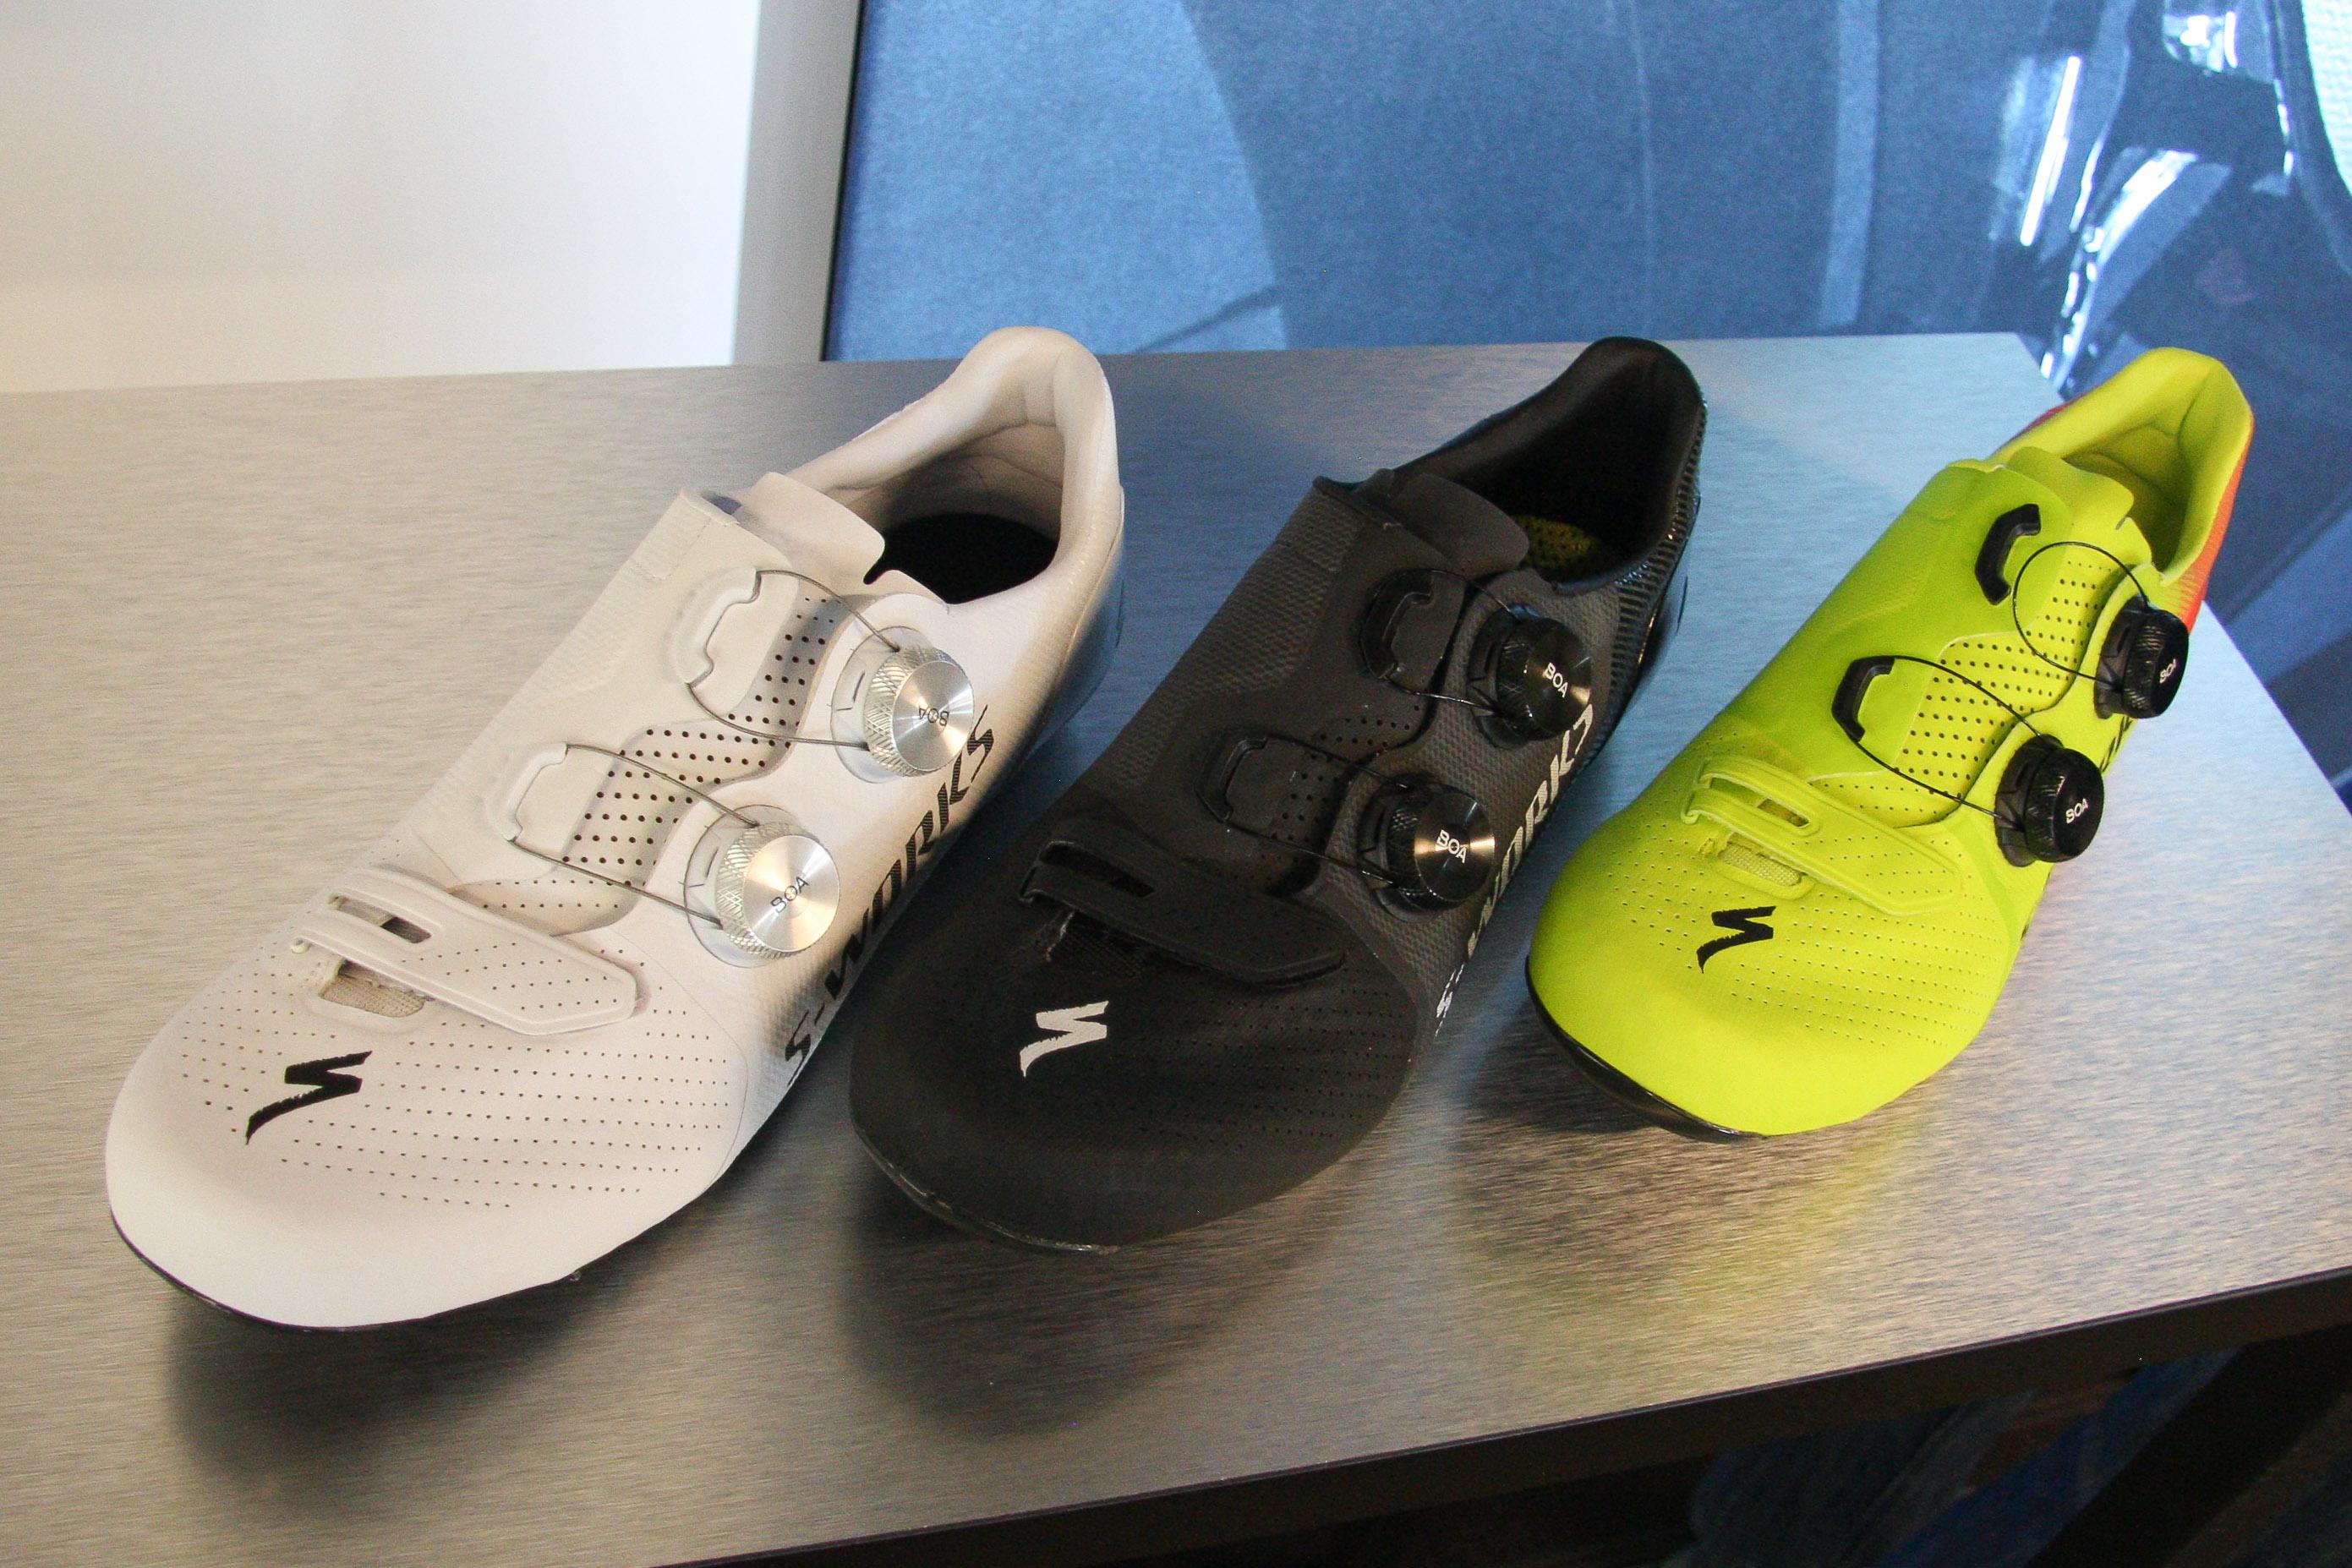 Specialized S Works 7 Shoe